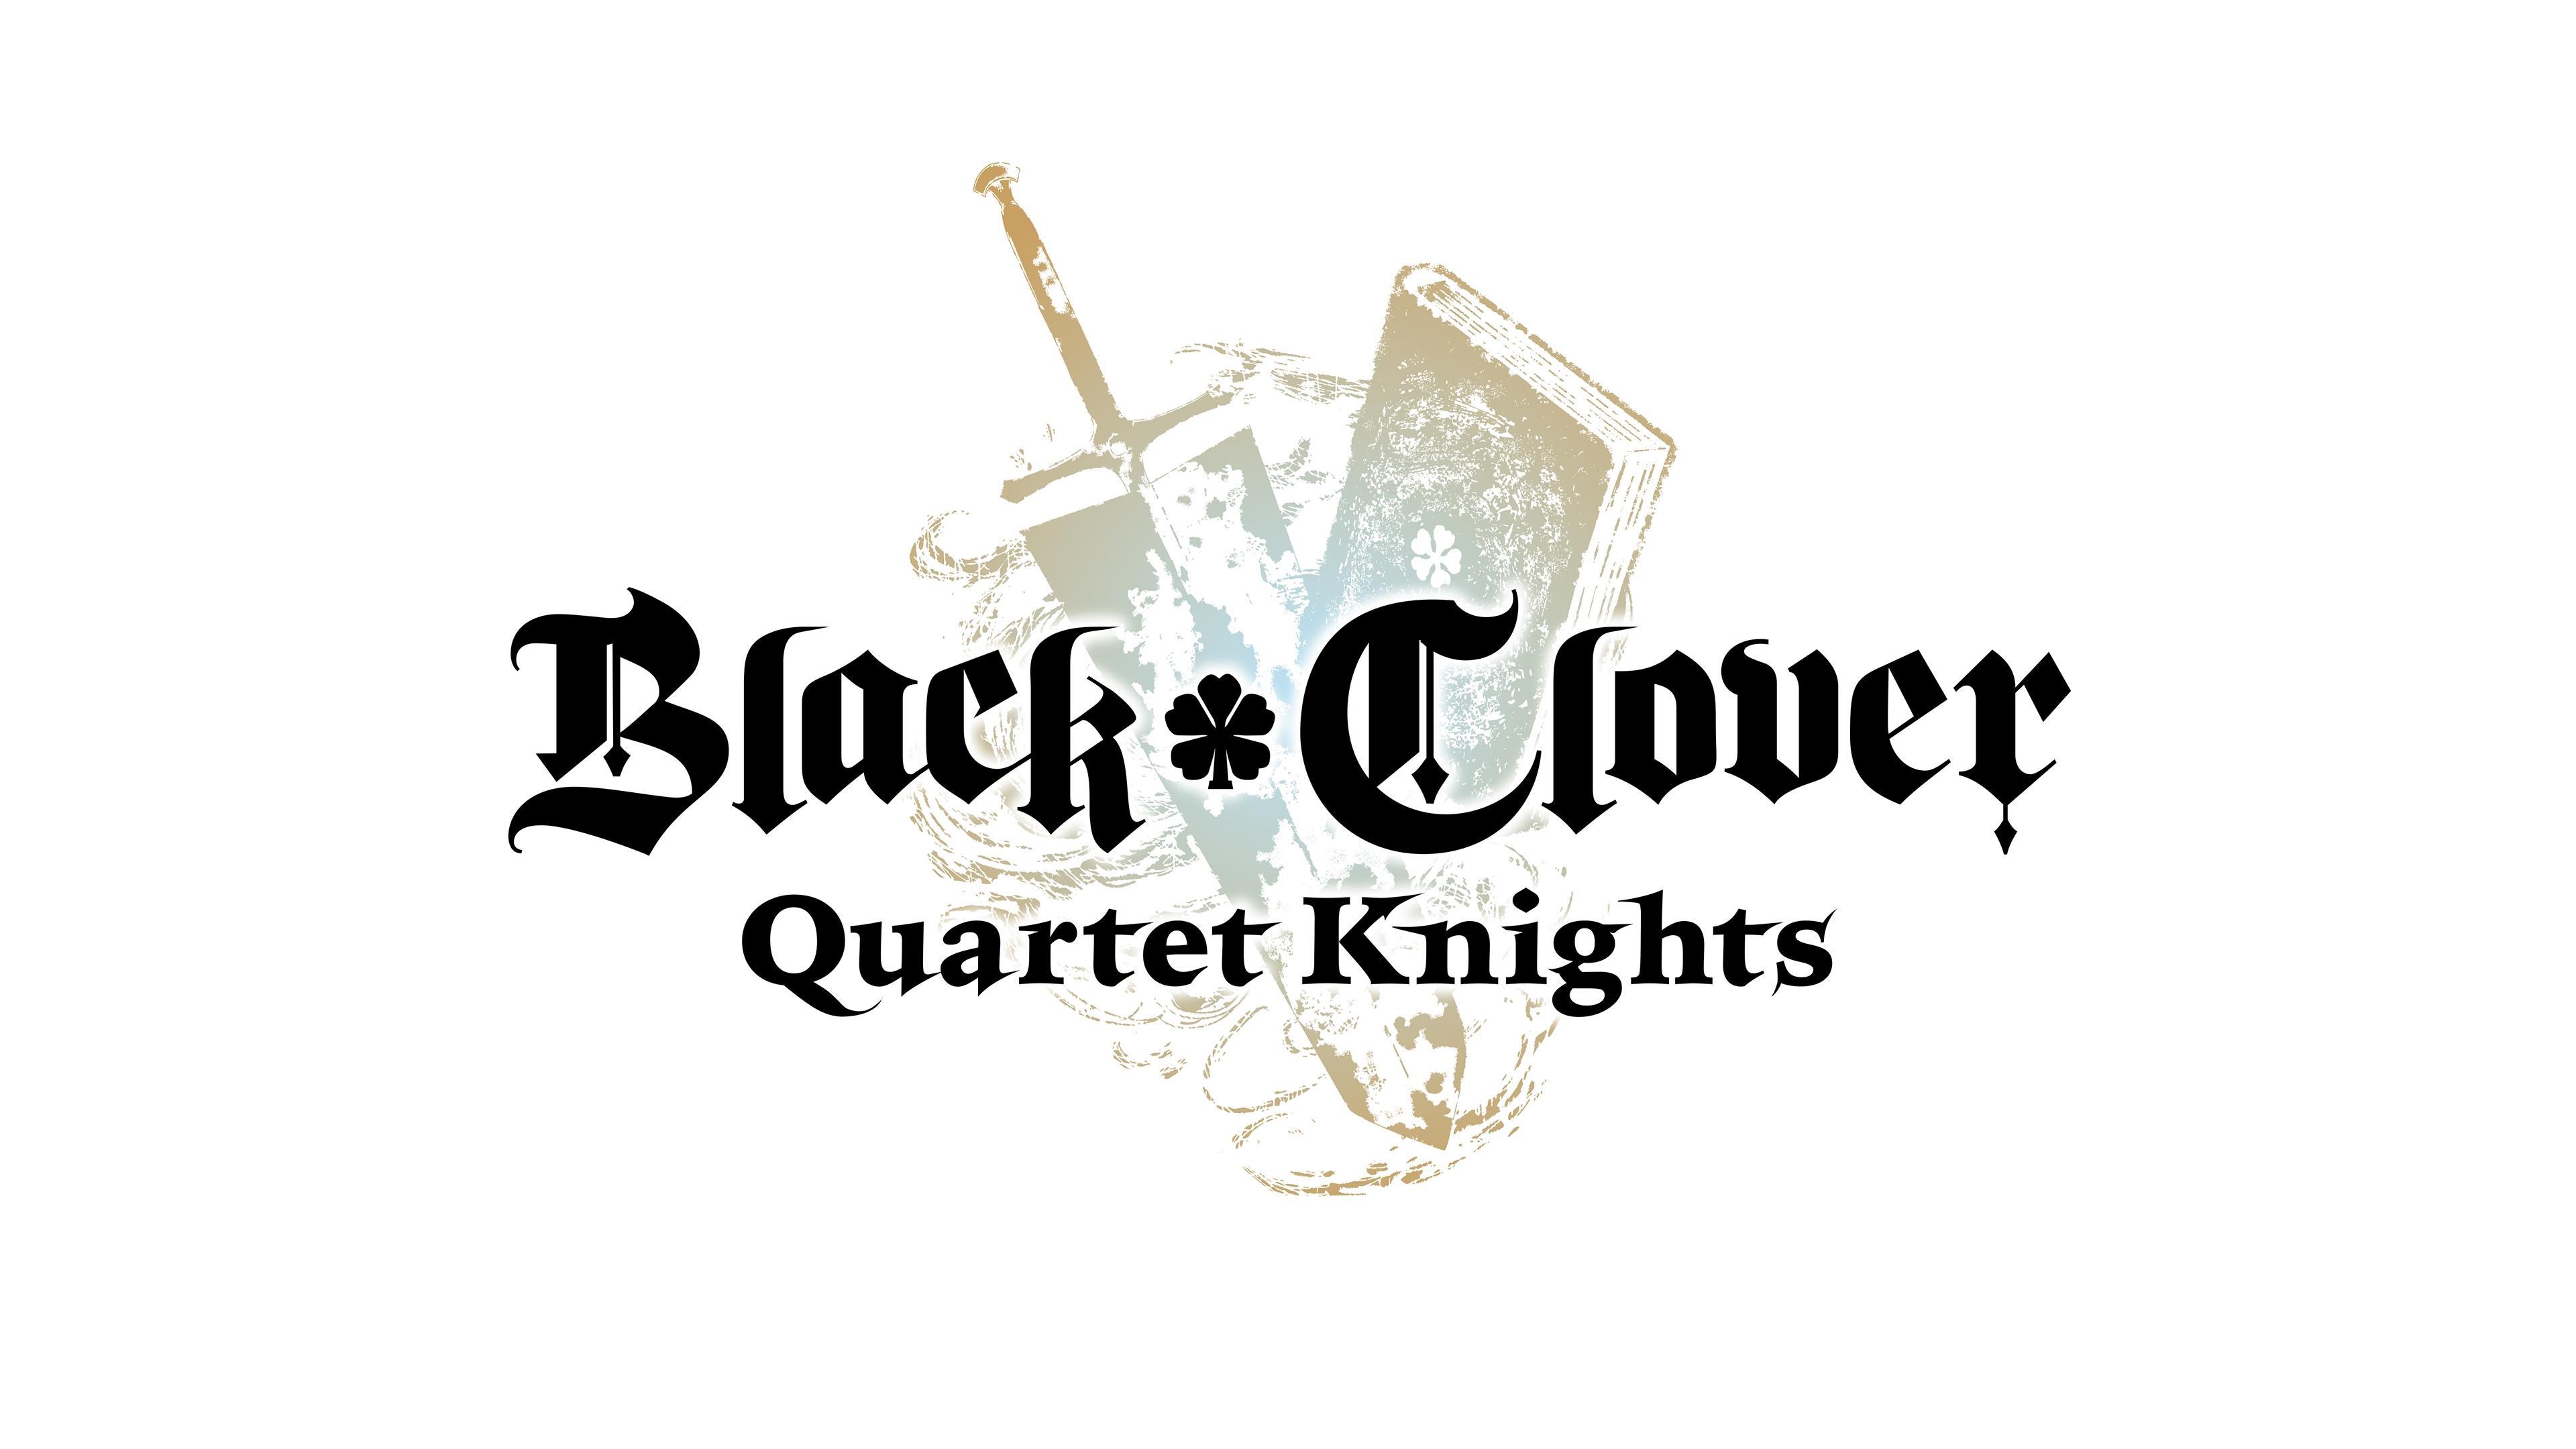 Black Clover 4K Logo Wallpapers - Top Free Black Clover 4K ...